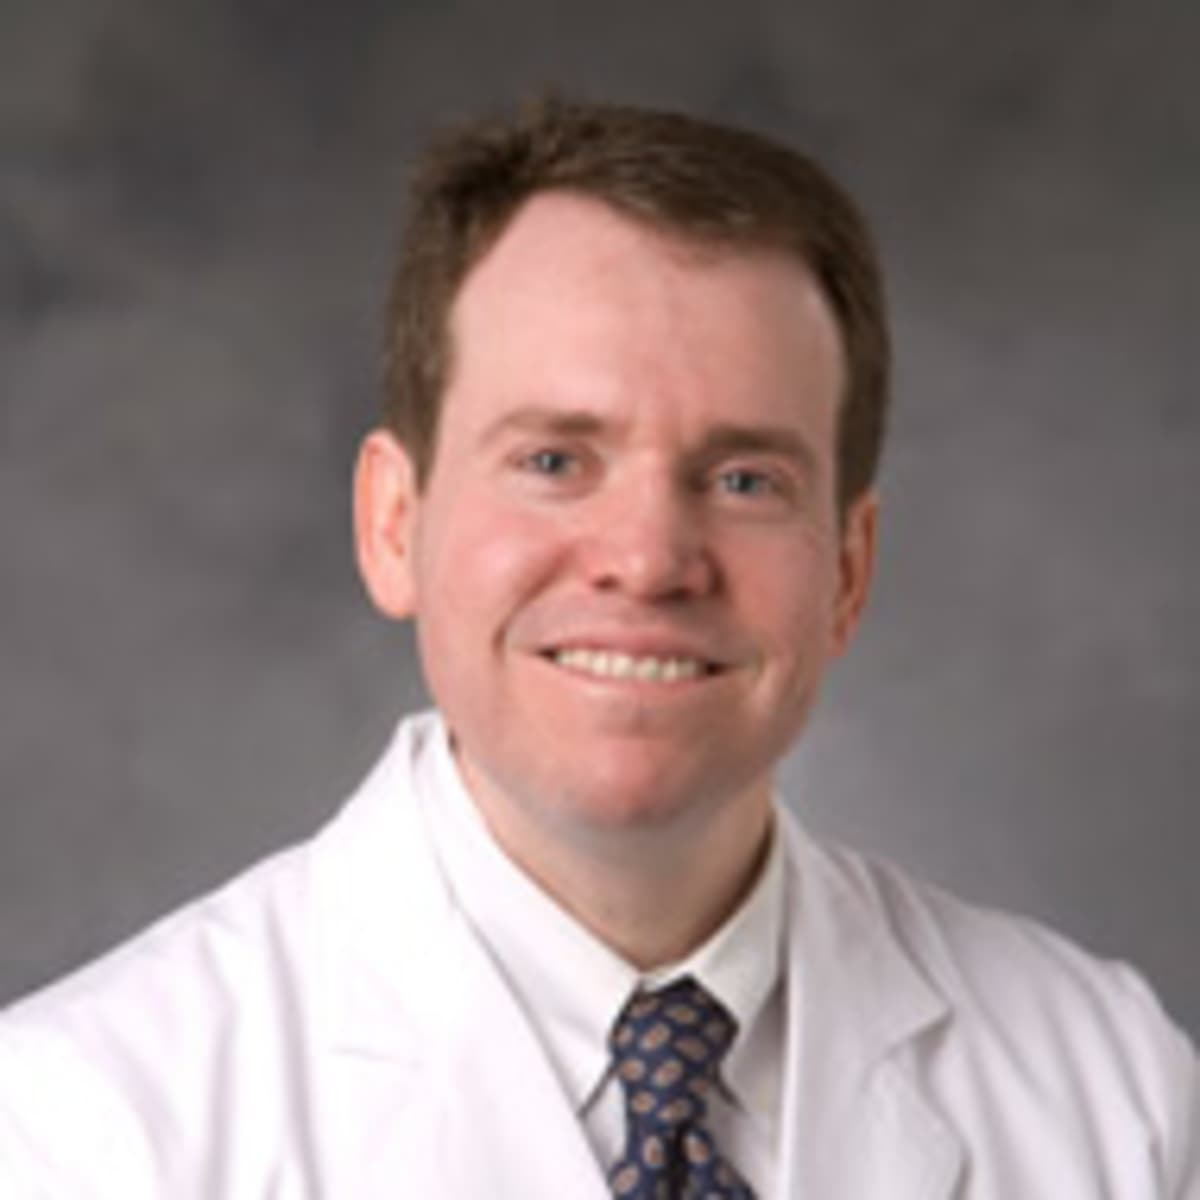 Robert Walters: Dr. Robert Walters, MD, PHD